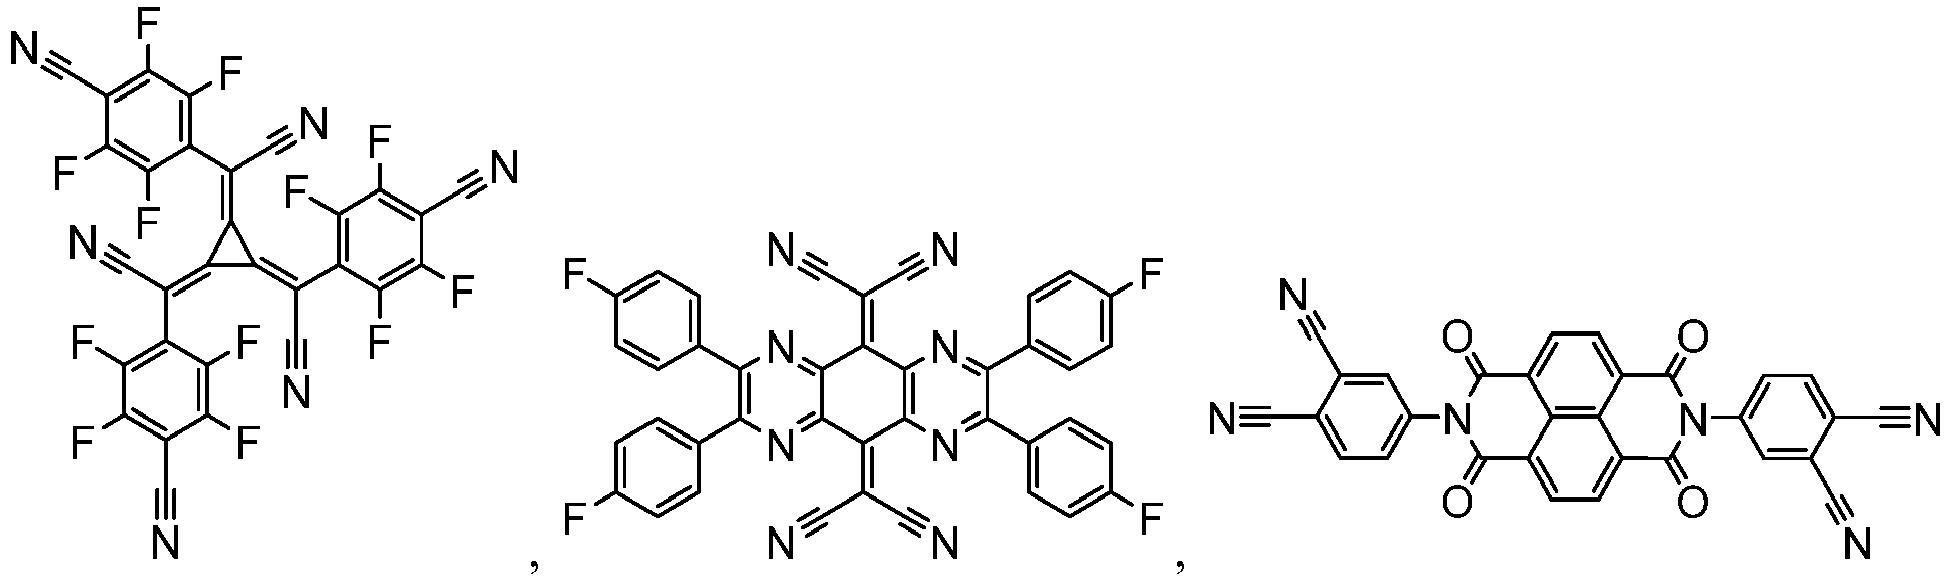 Figure imgb0833